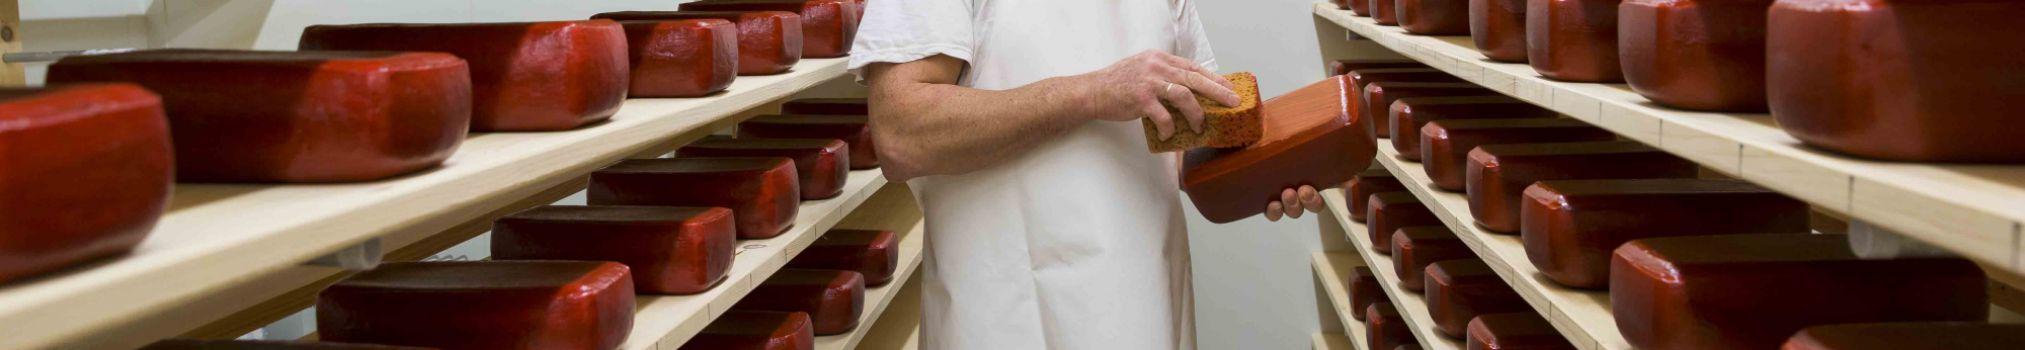 Het kaasmaakproces